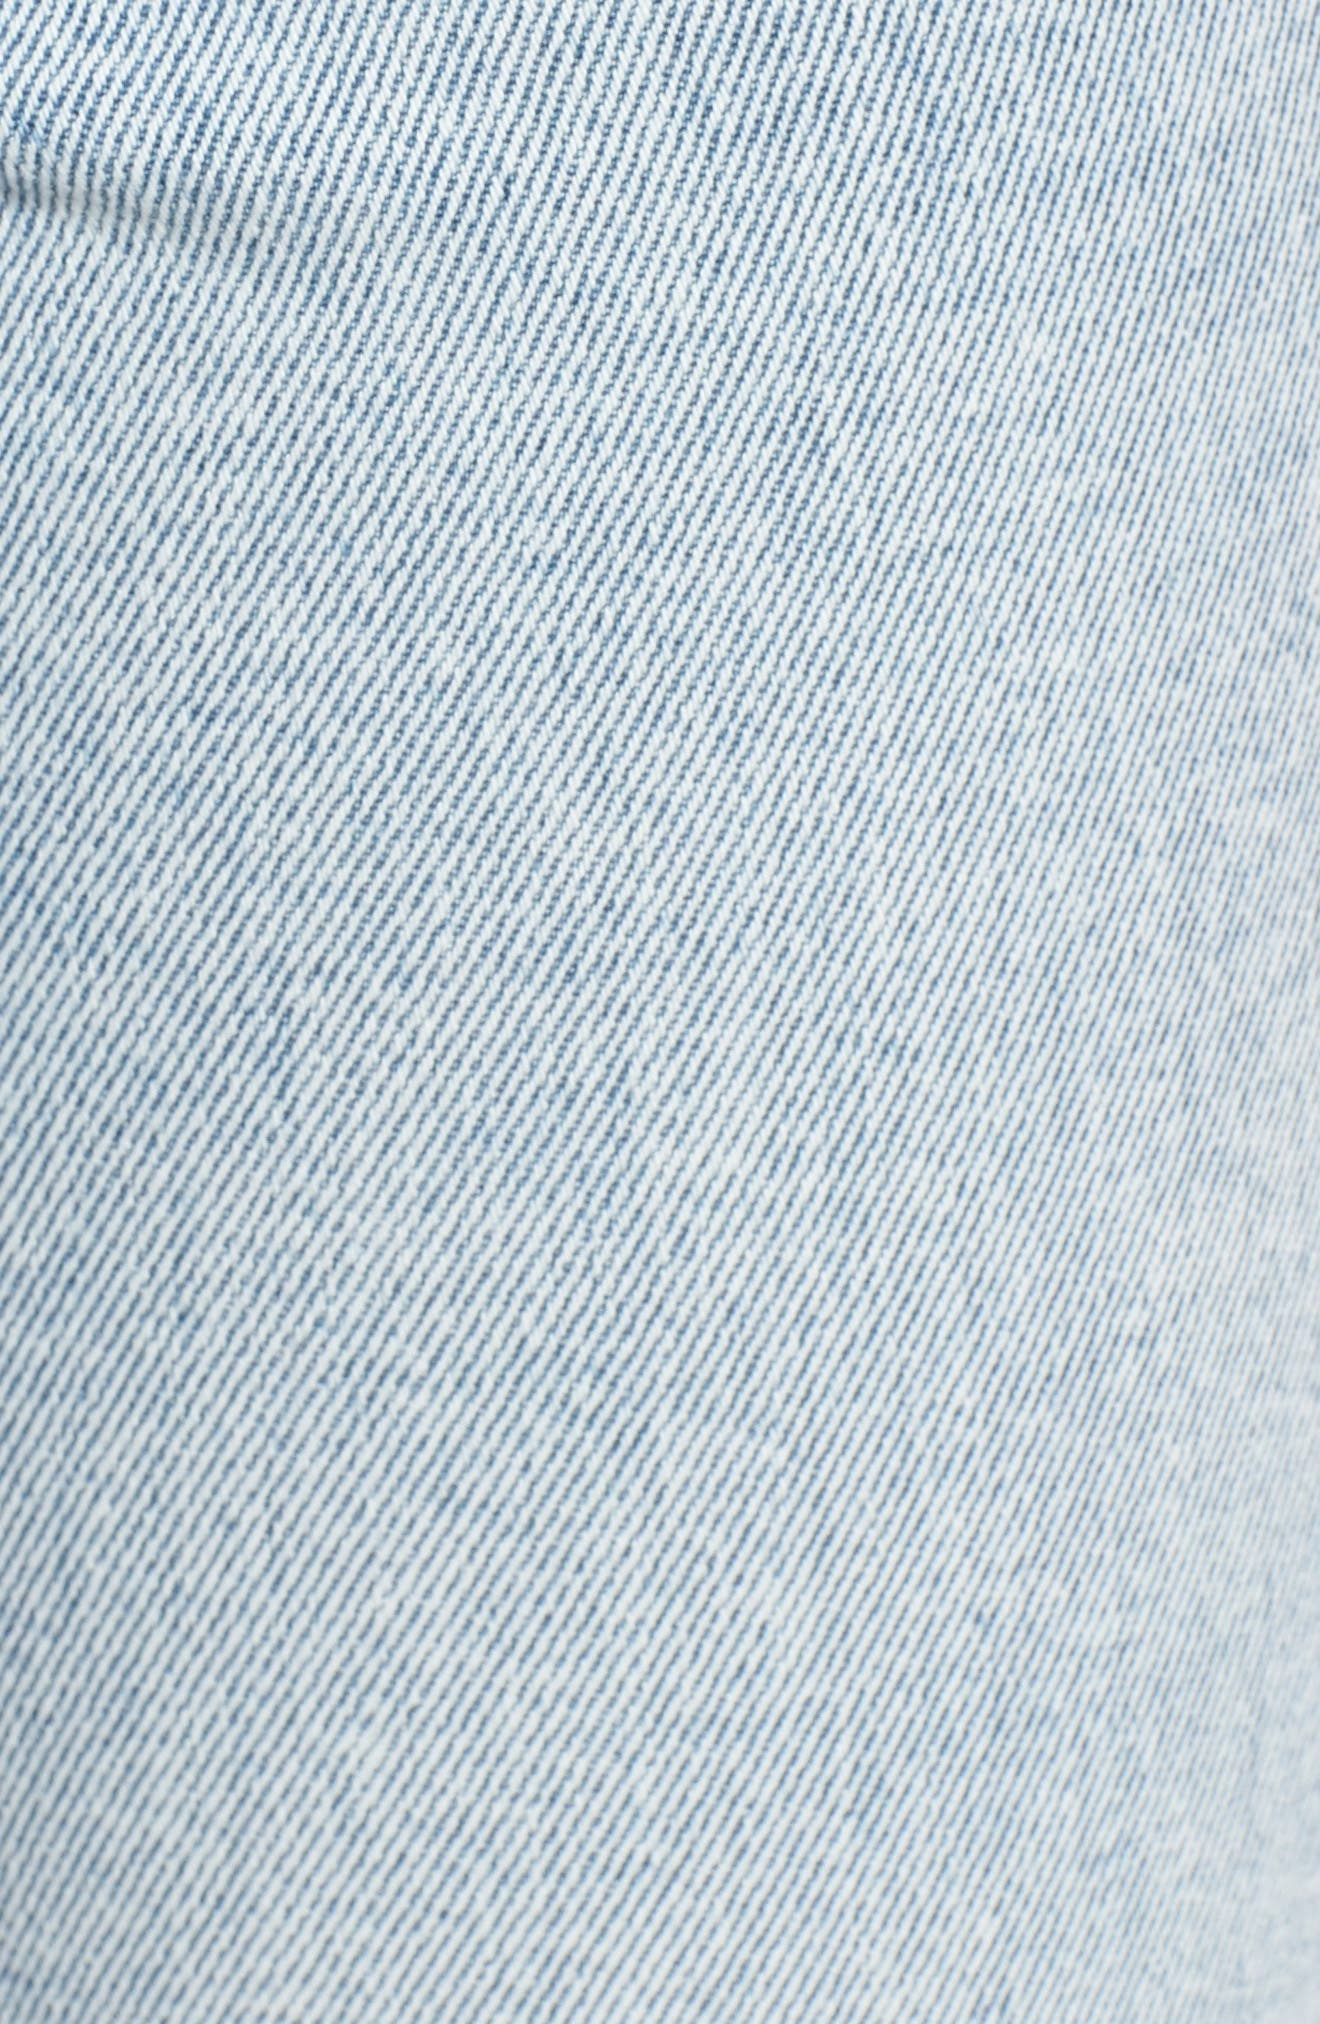 Acid Wash High Waist Crop Jeans,                             Alternate thumbnail 3, color,                             Light Acid